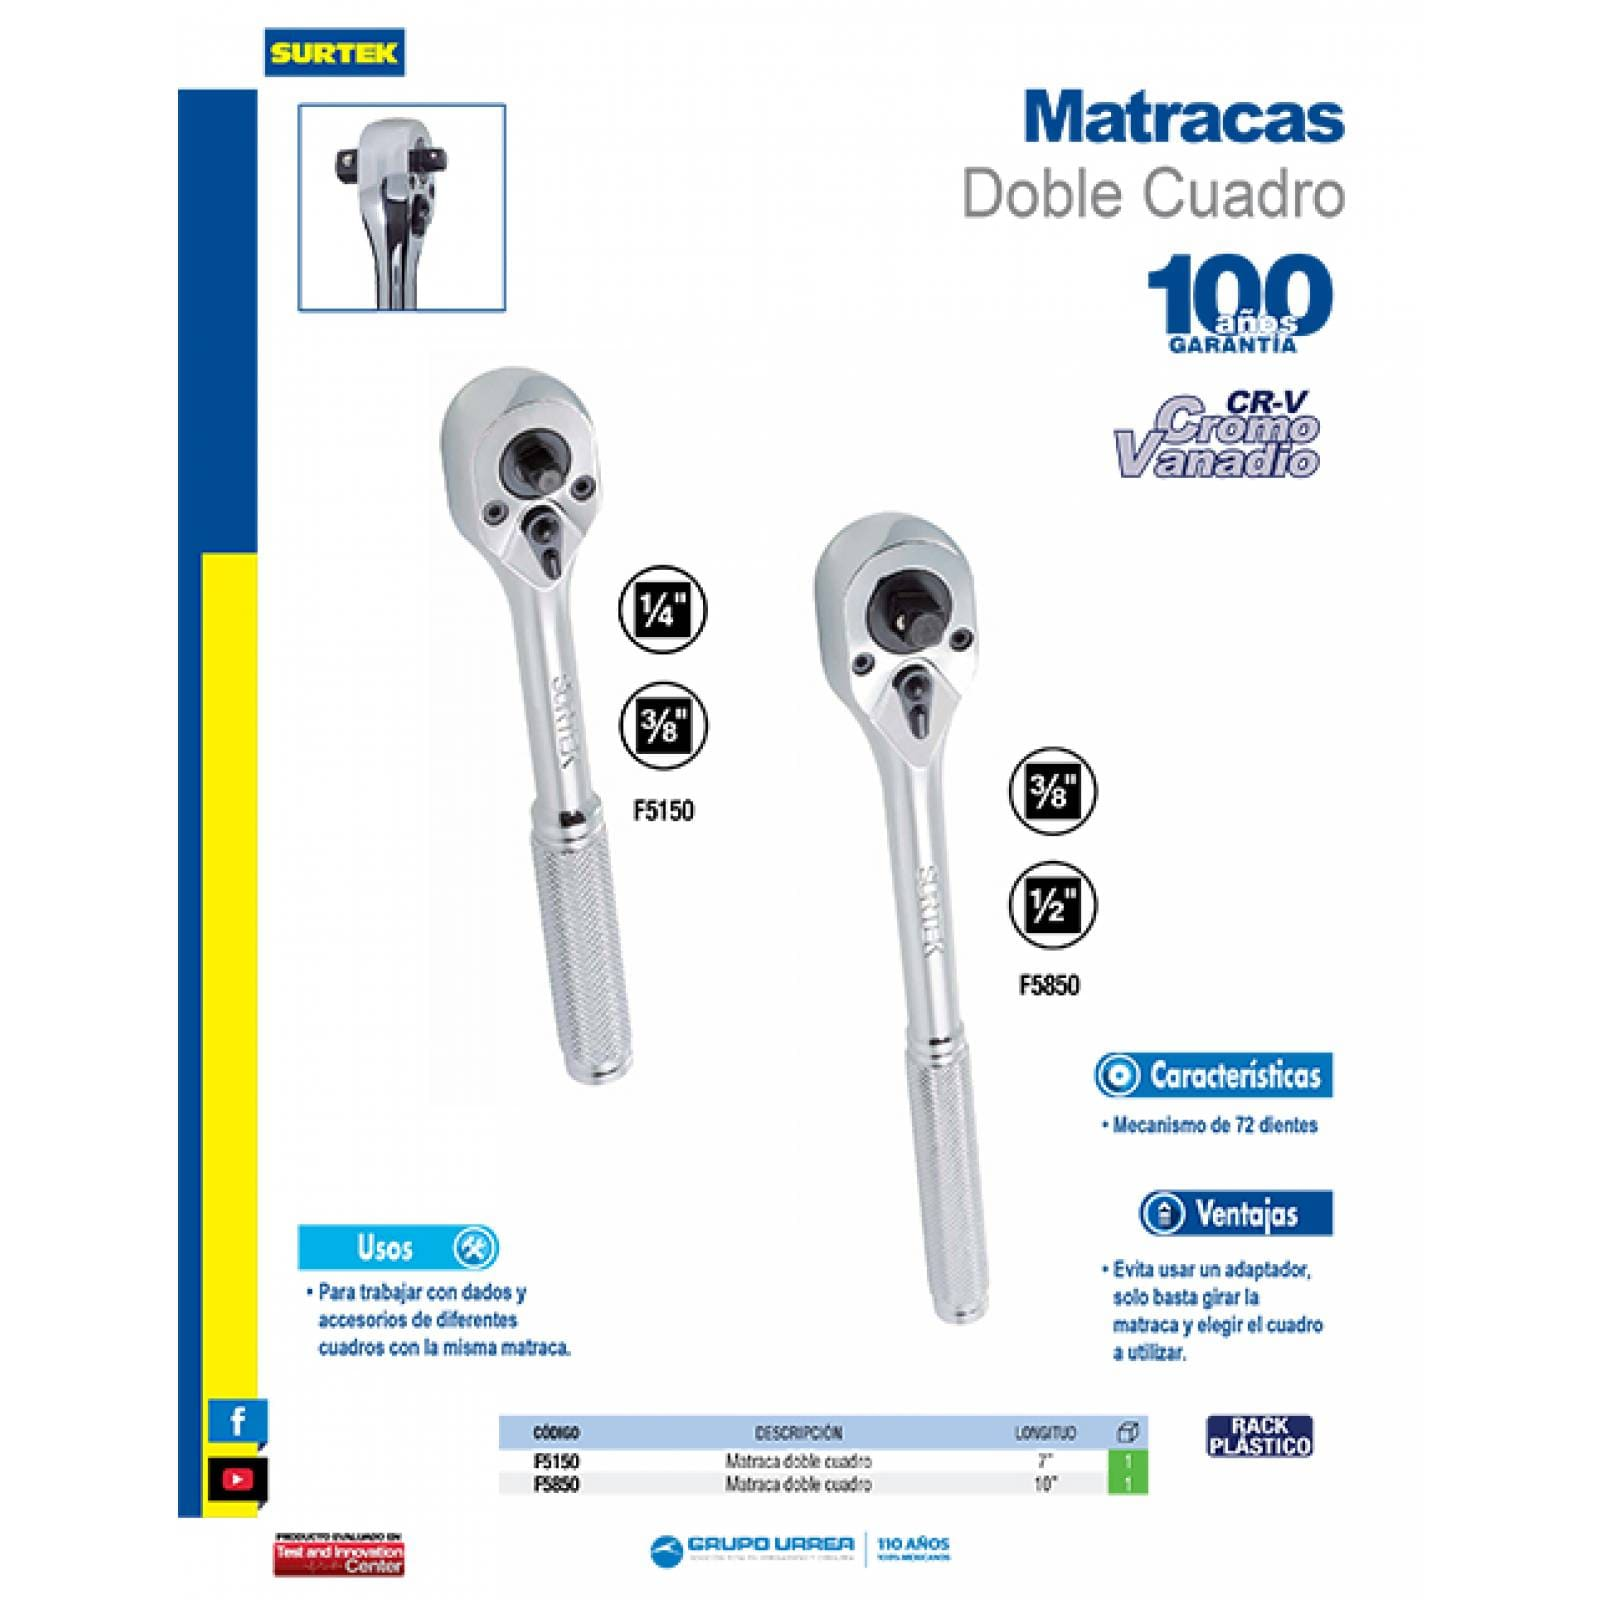 "Matraca Doble Cuadro 3/8"" -1/2"" Longitud 10"" F5850 Surtek"